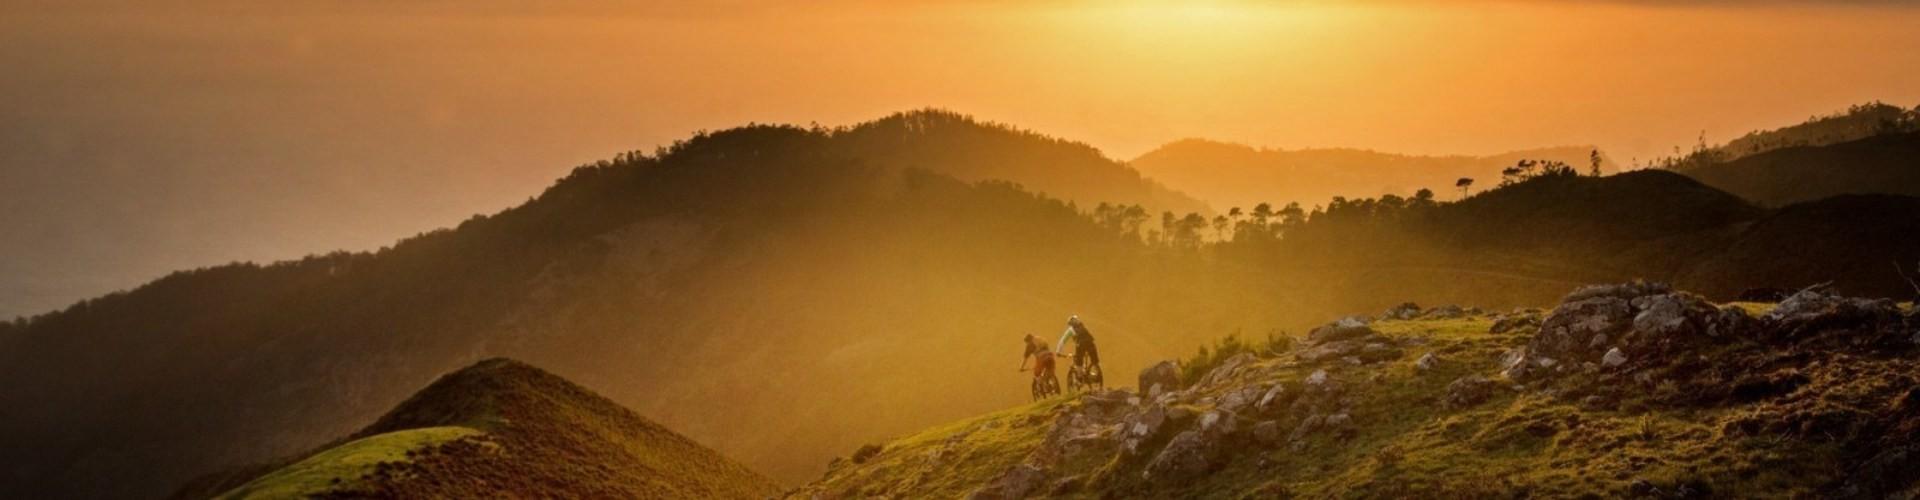 Mountain Biking Experience in Madeira Island